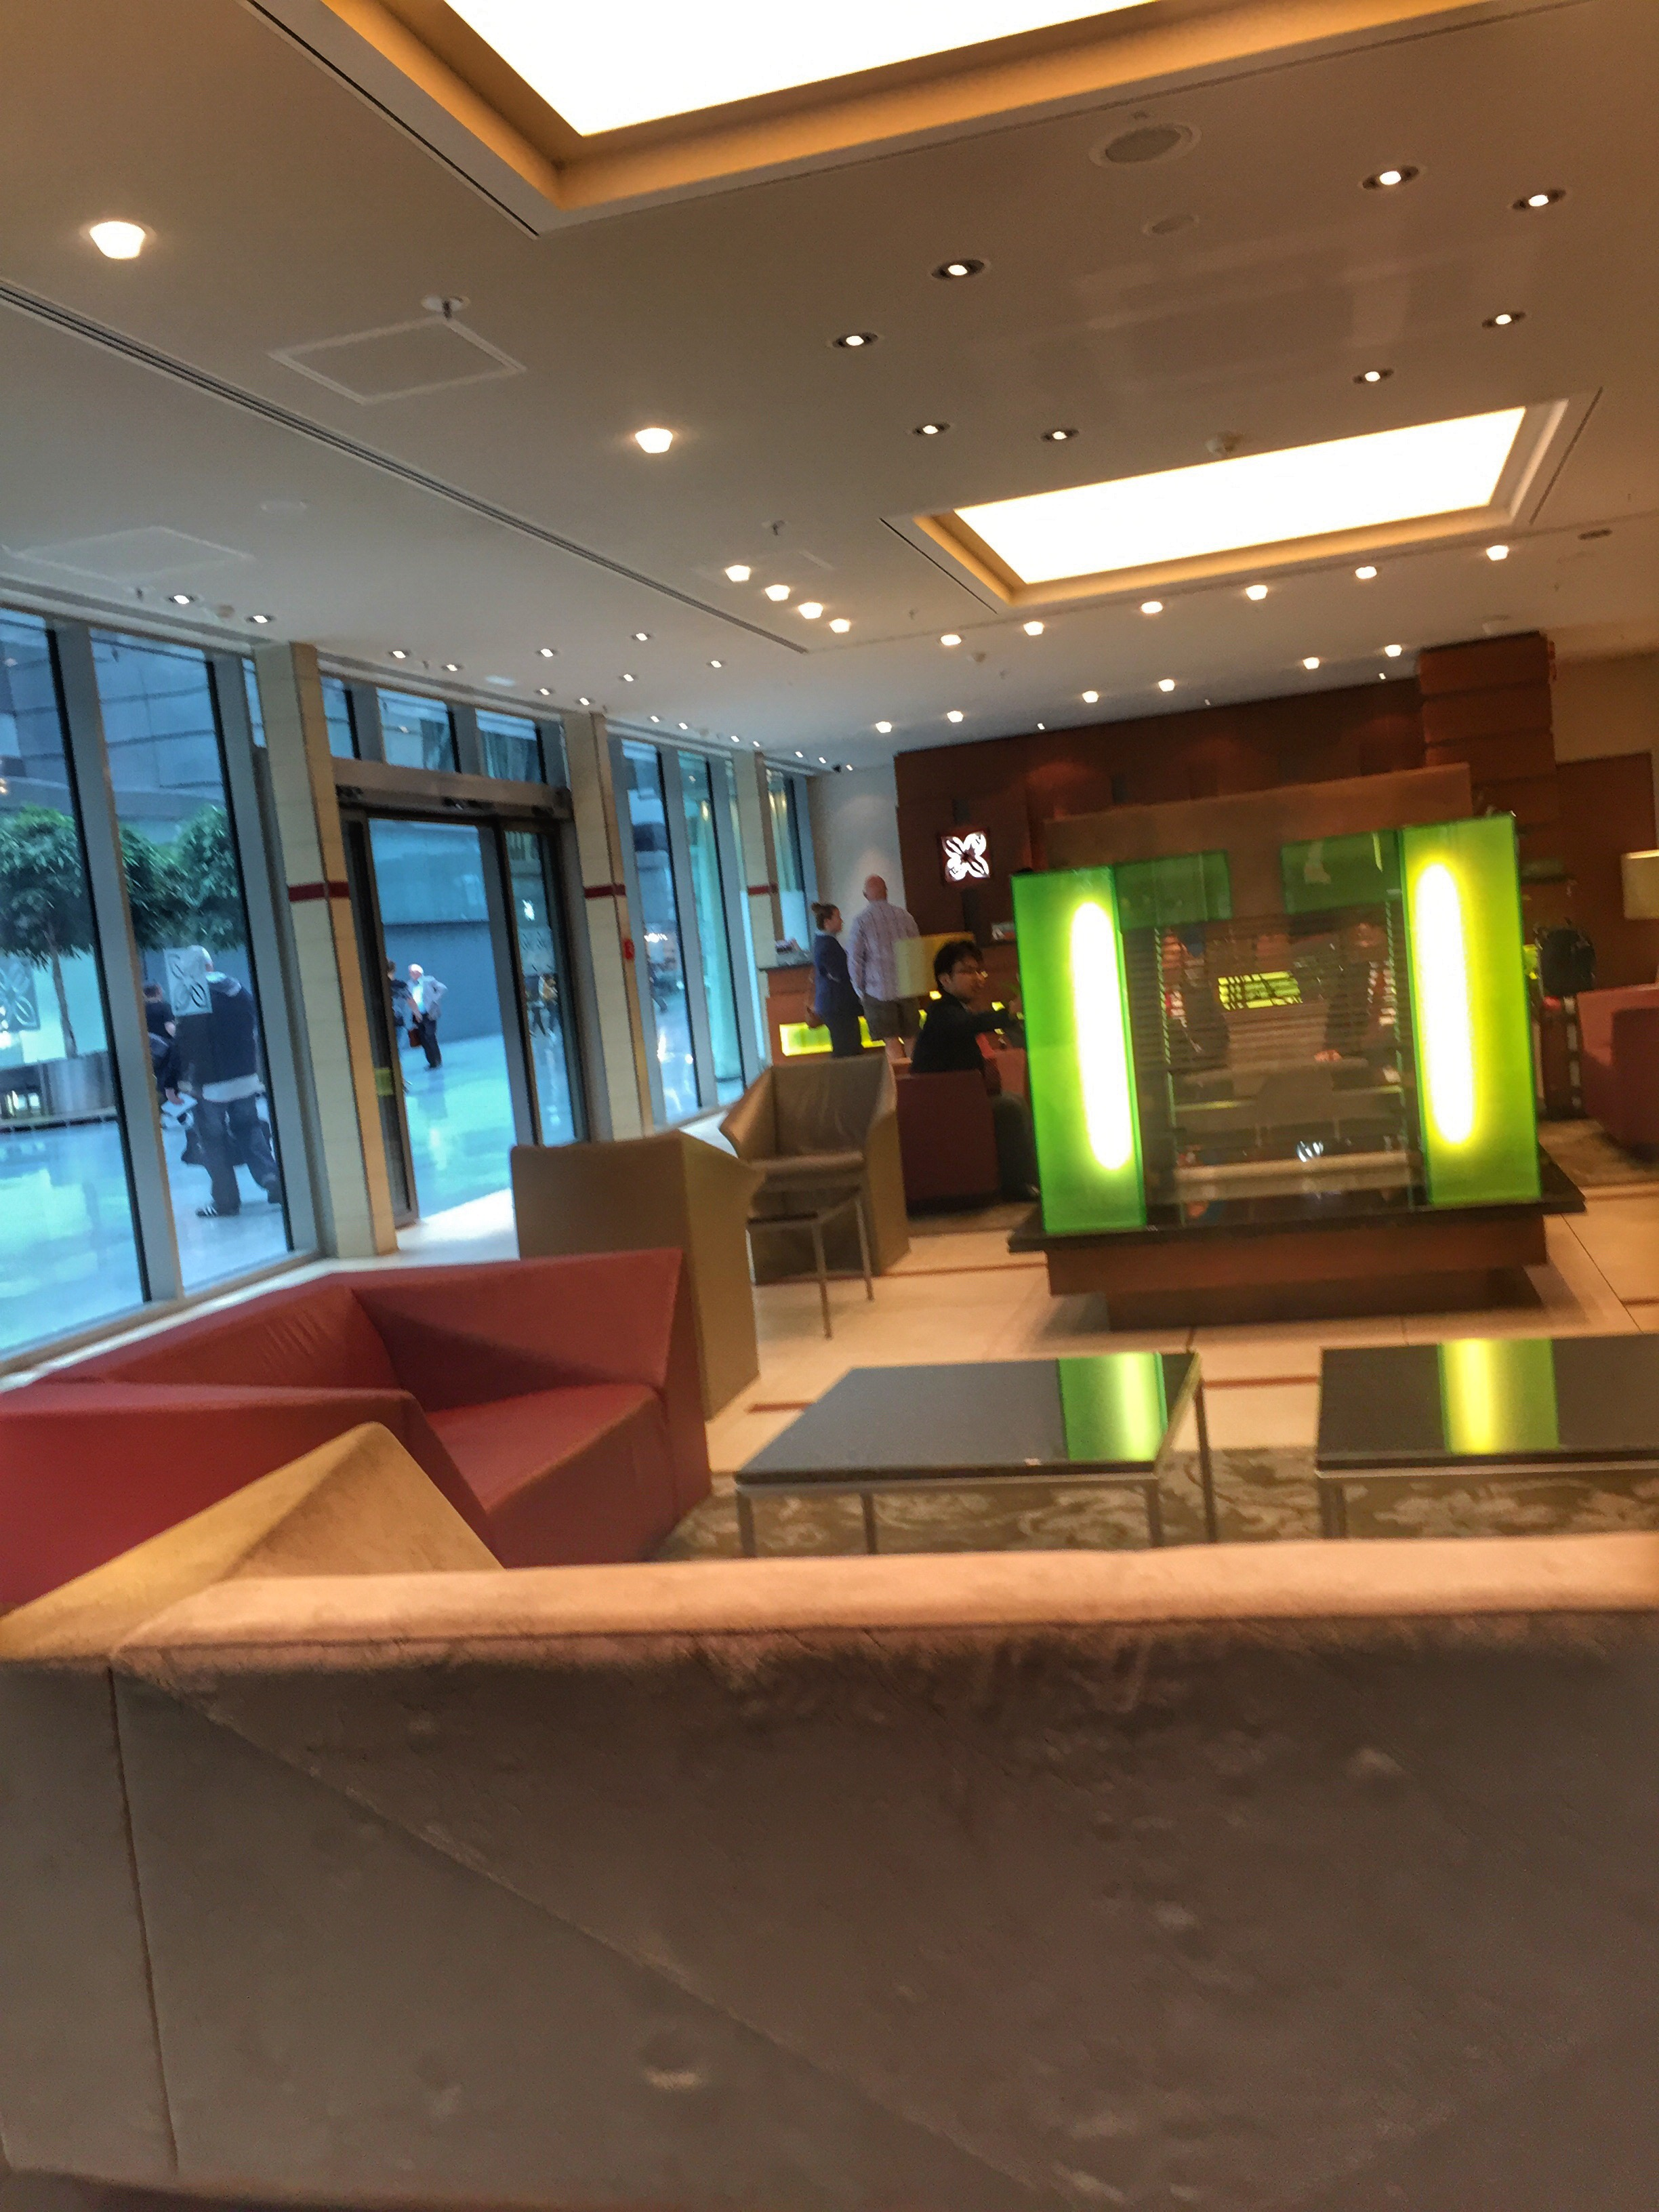 hilton garden inn frankfurt airport hotel - Hilton Garden Inn Frankfurt Airport